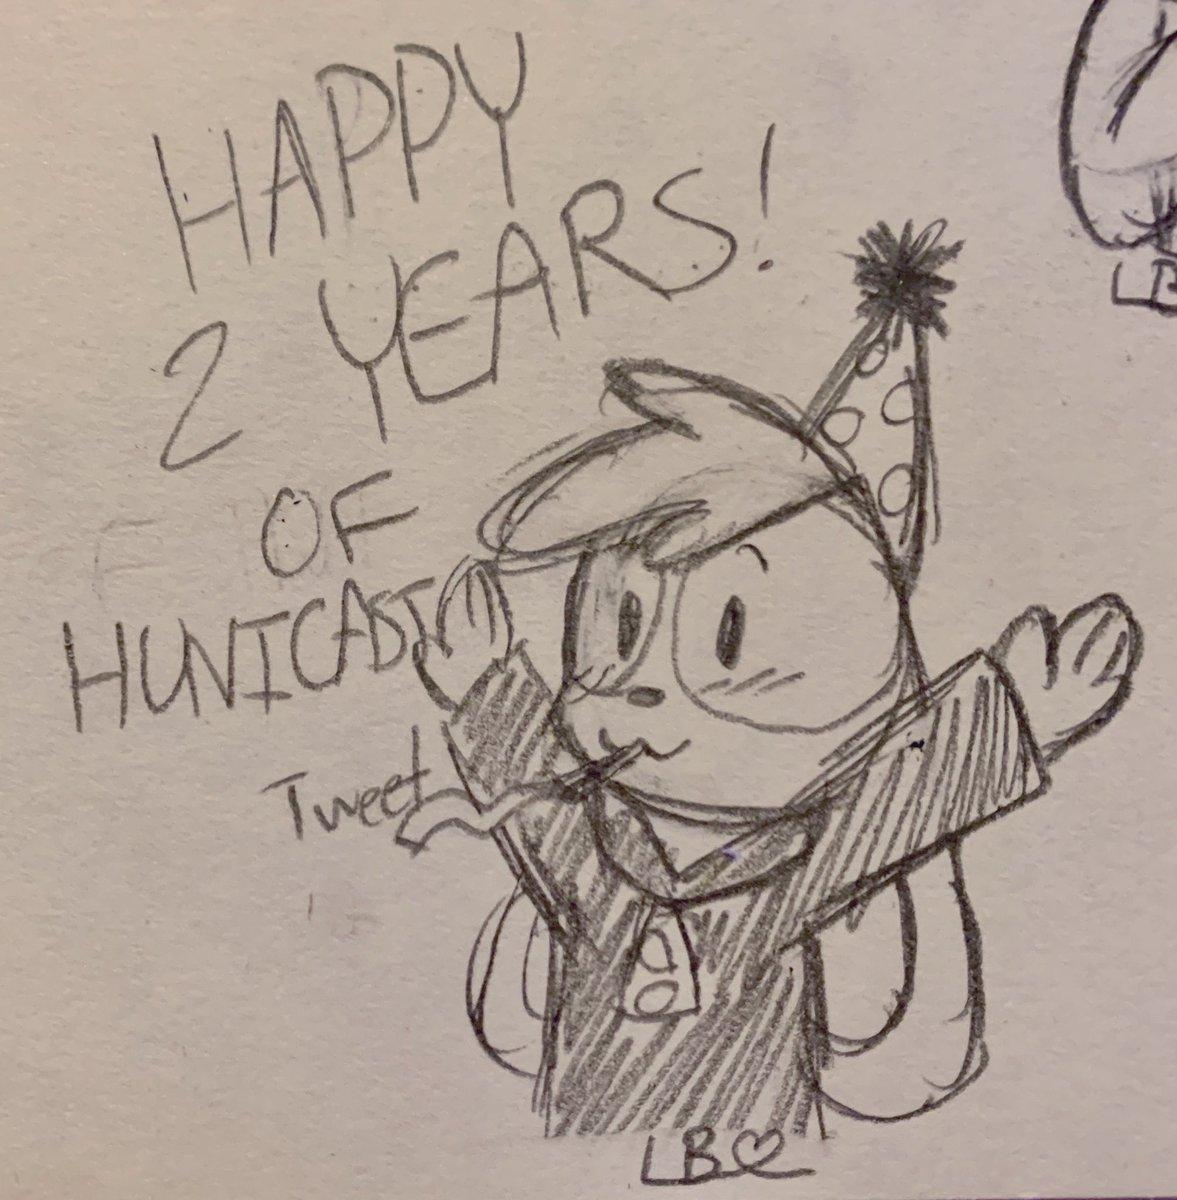 HAPPY BIRTHDAY HUNICAST!!! @AshNicholsArt #HuniCast